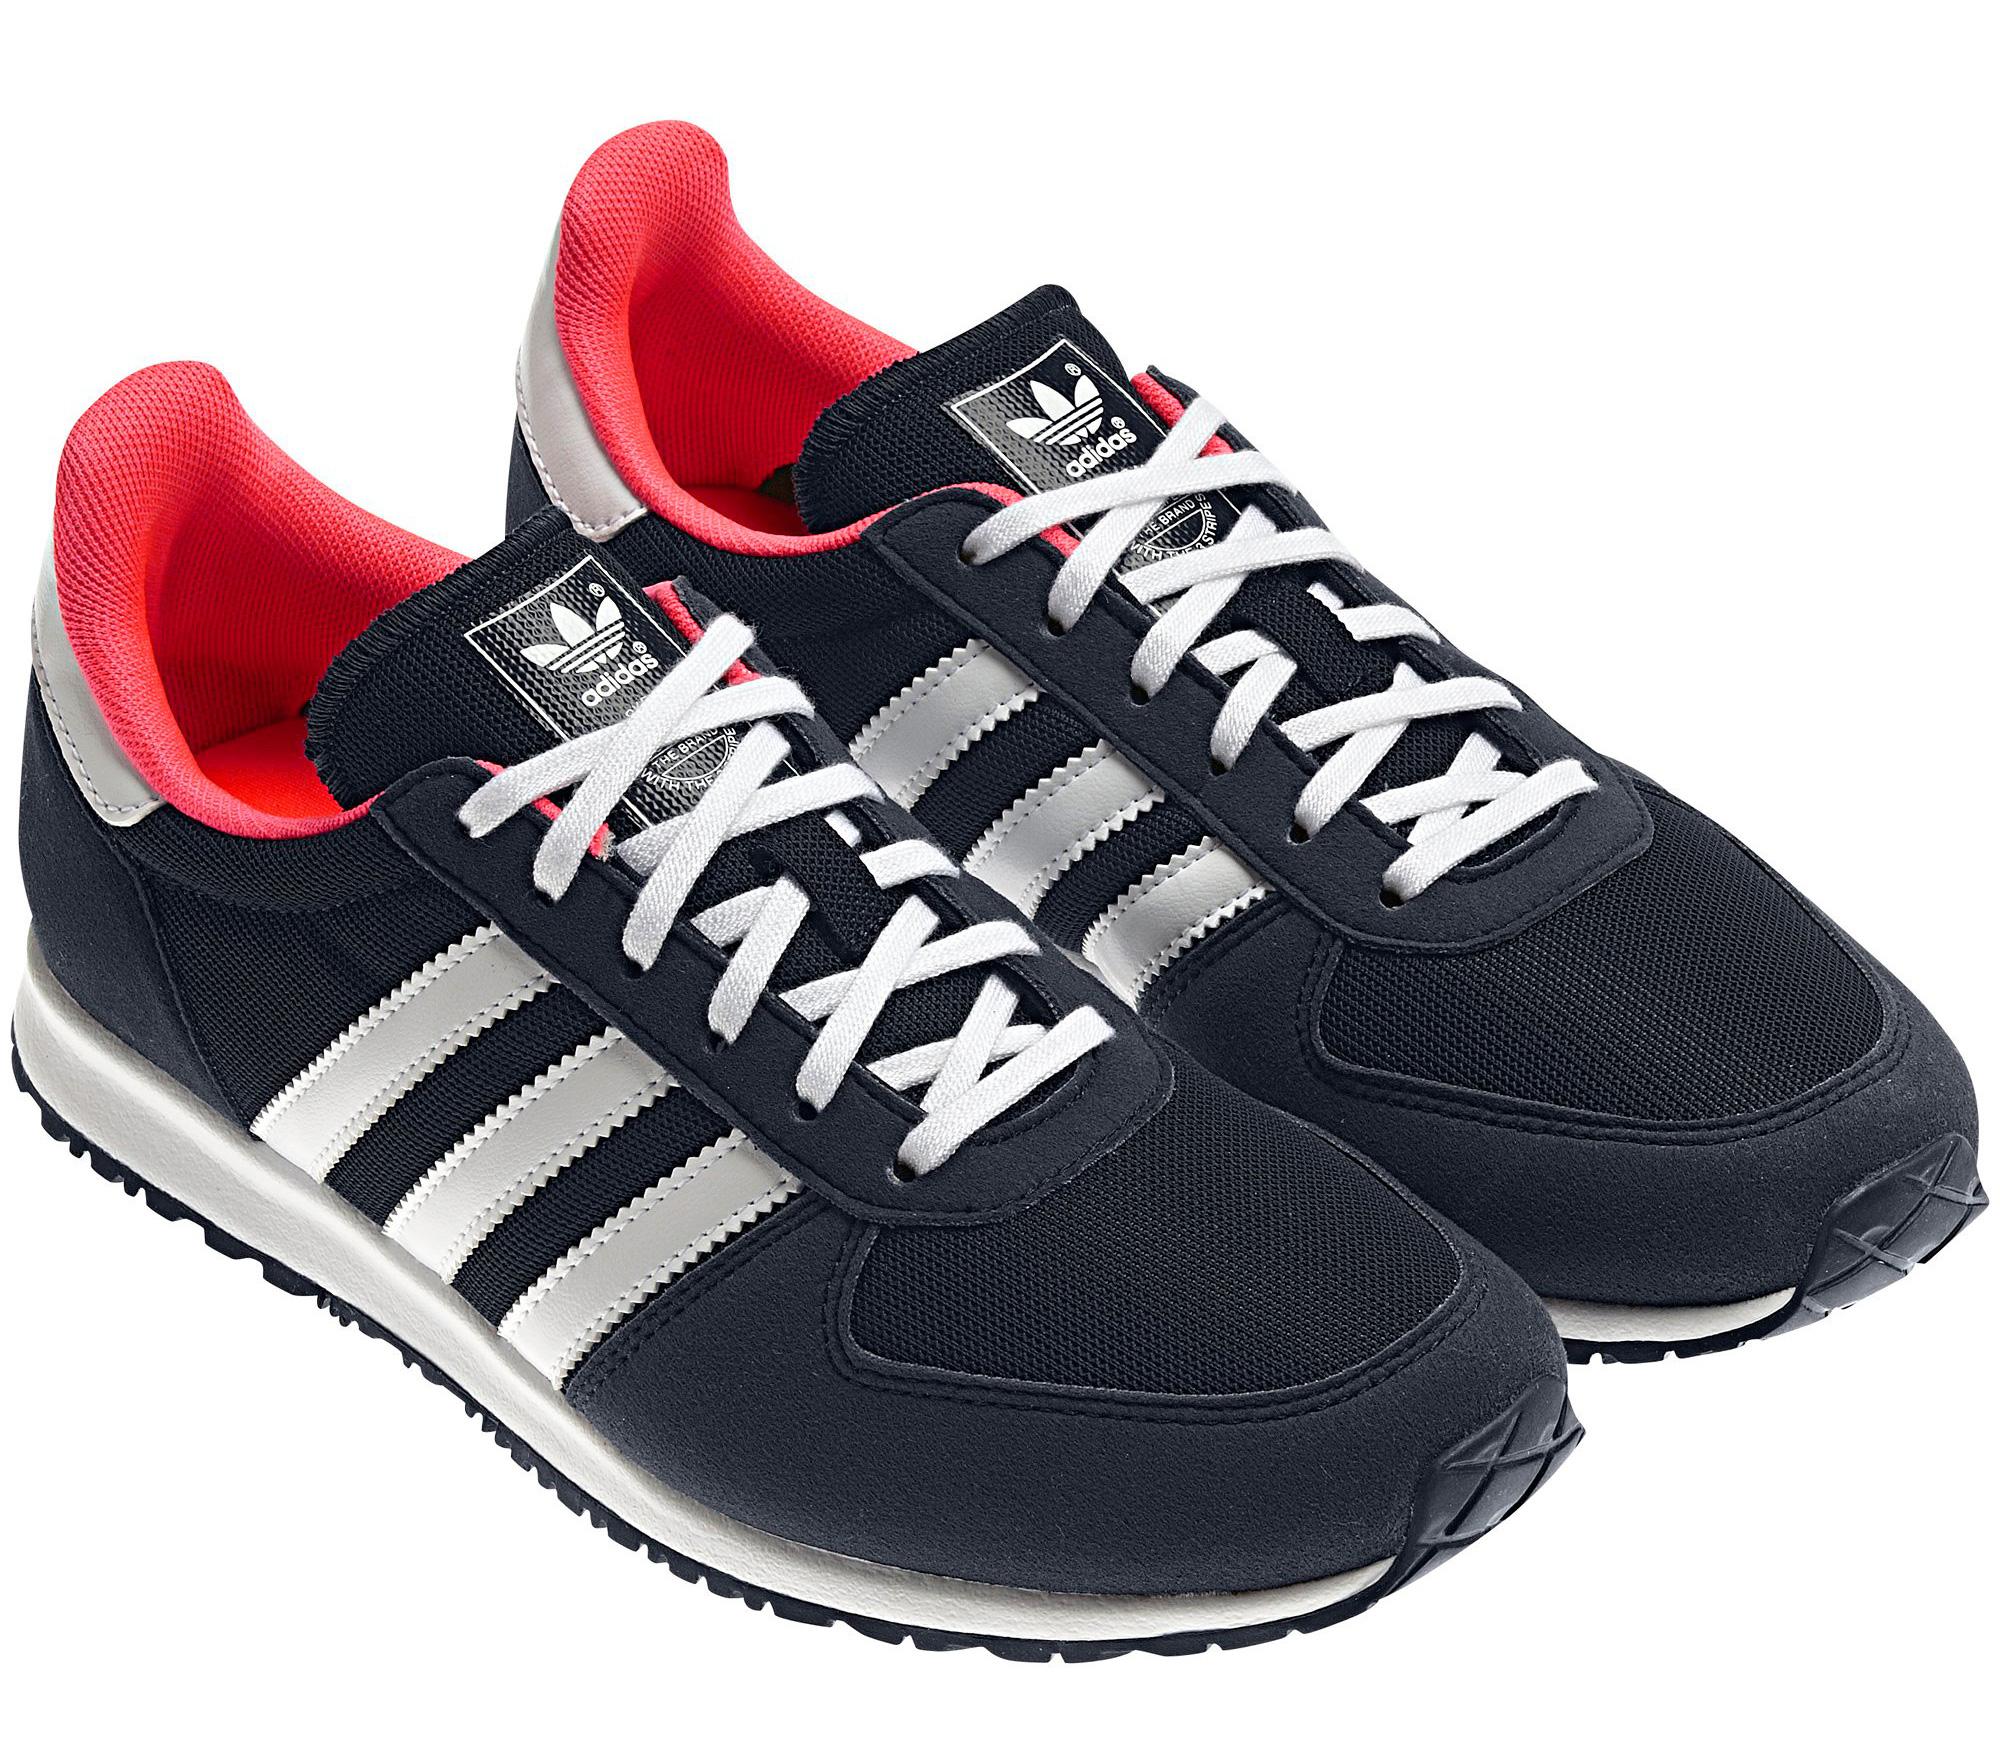 Adidas Adistar Racer | Sofies Sneakers